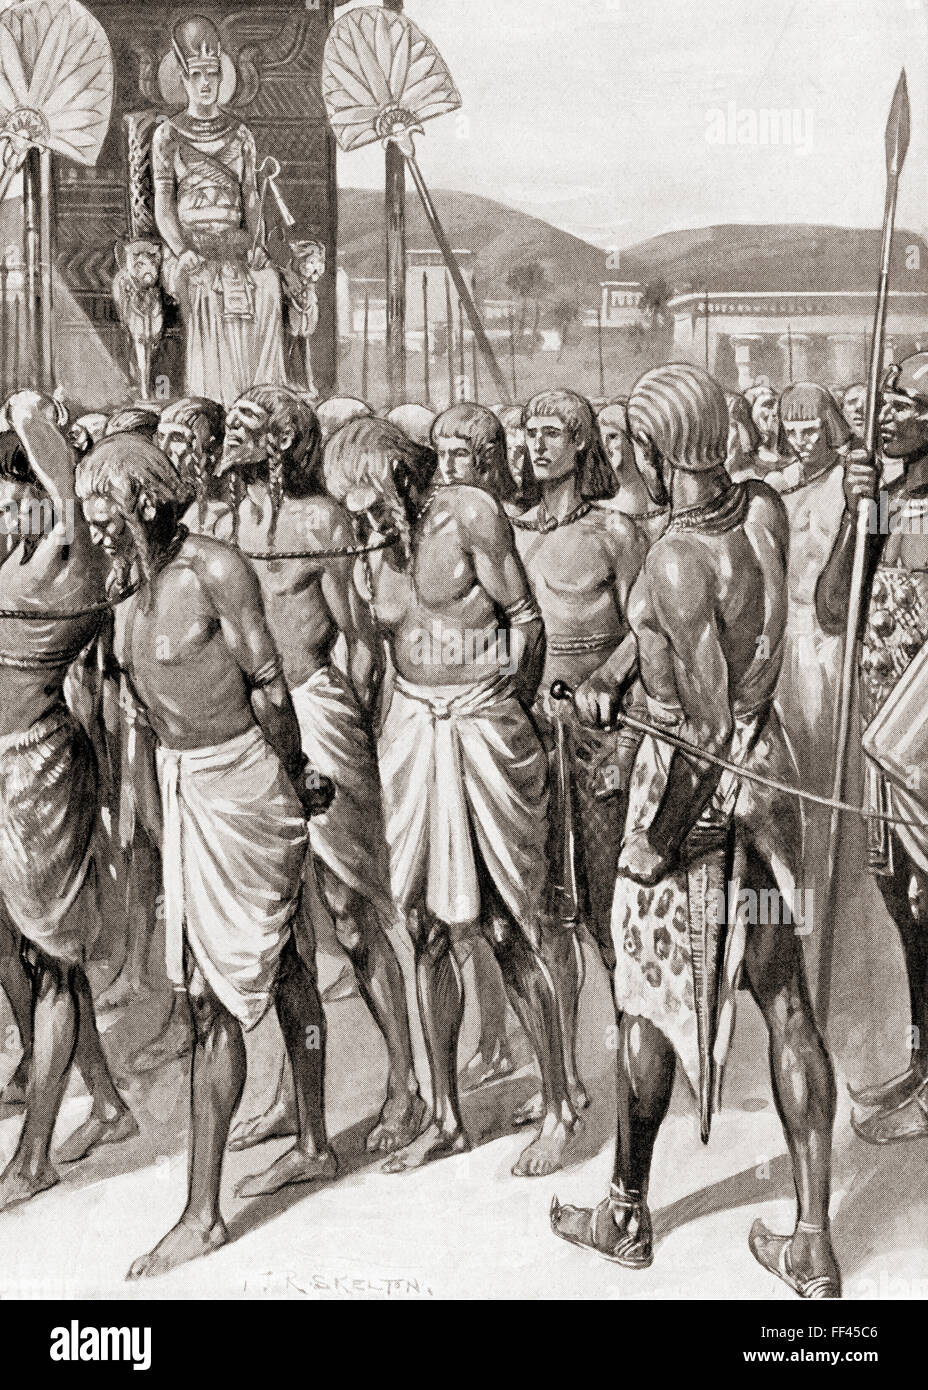 Captives before the Pharaoh. - Stock Image